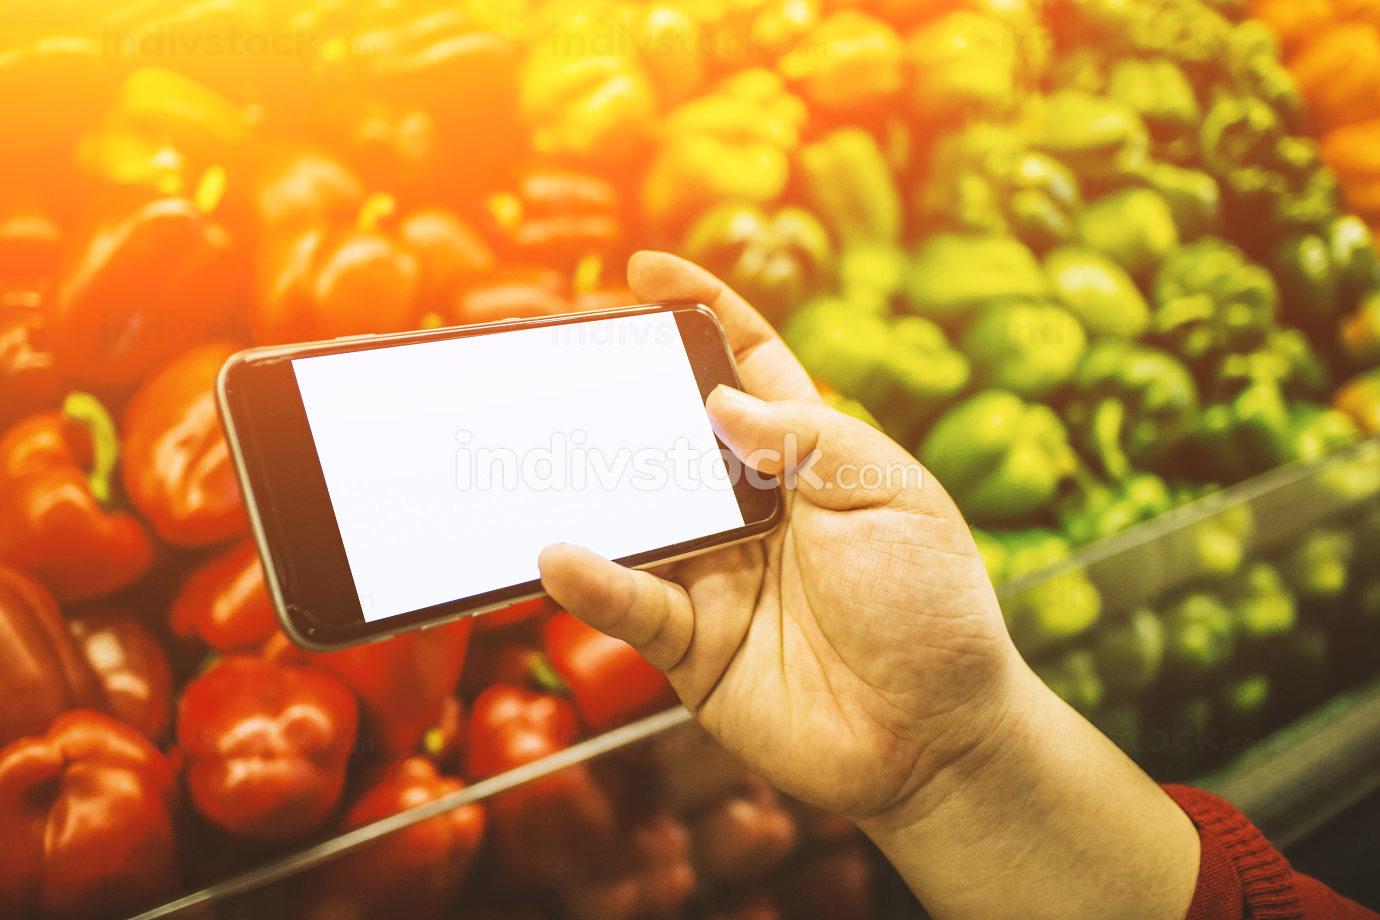 Hand holding smart phone on blurred market background - shopping online nice mockup